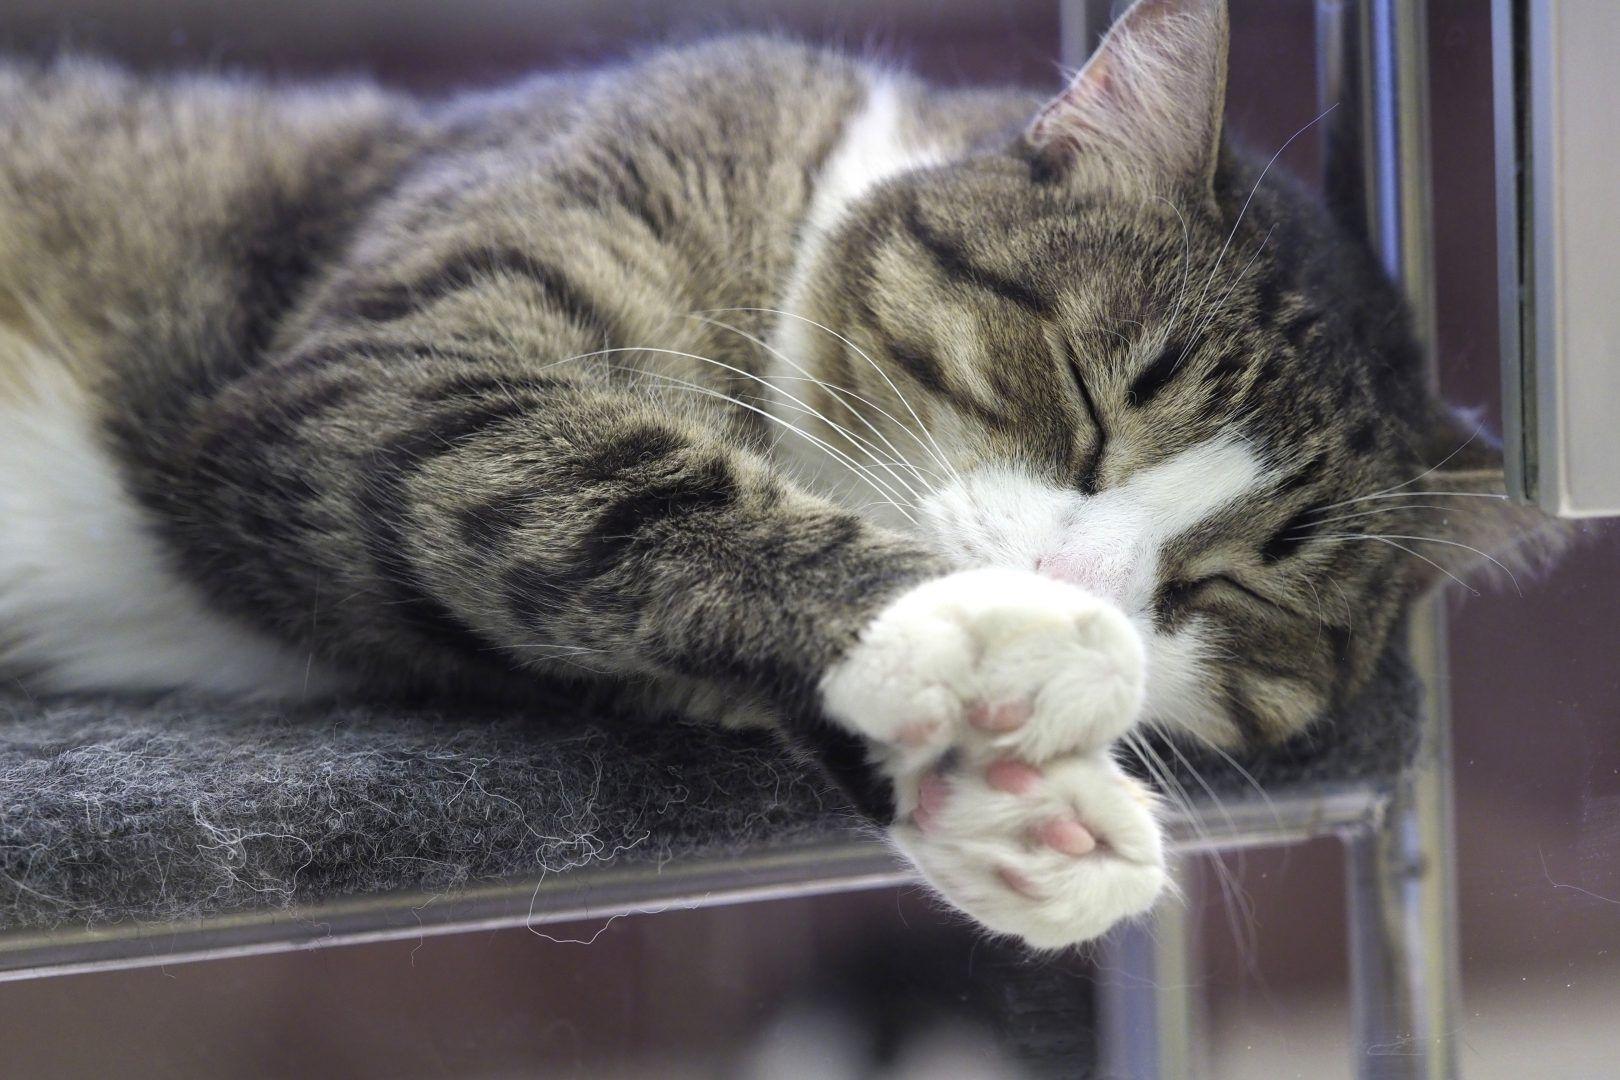 Кошачье мурлыканье благотворно влияет на человека. Фото: Антон Гердо